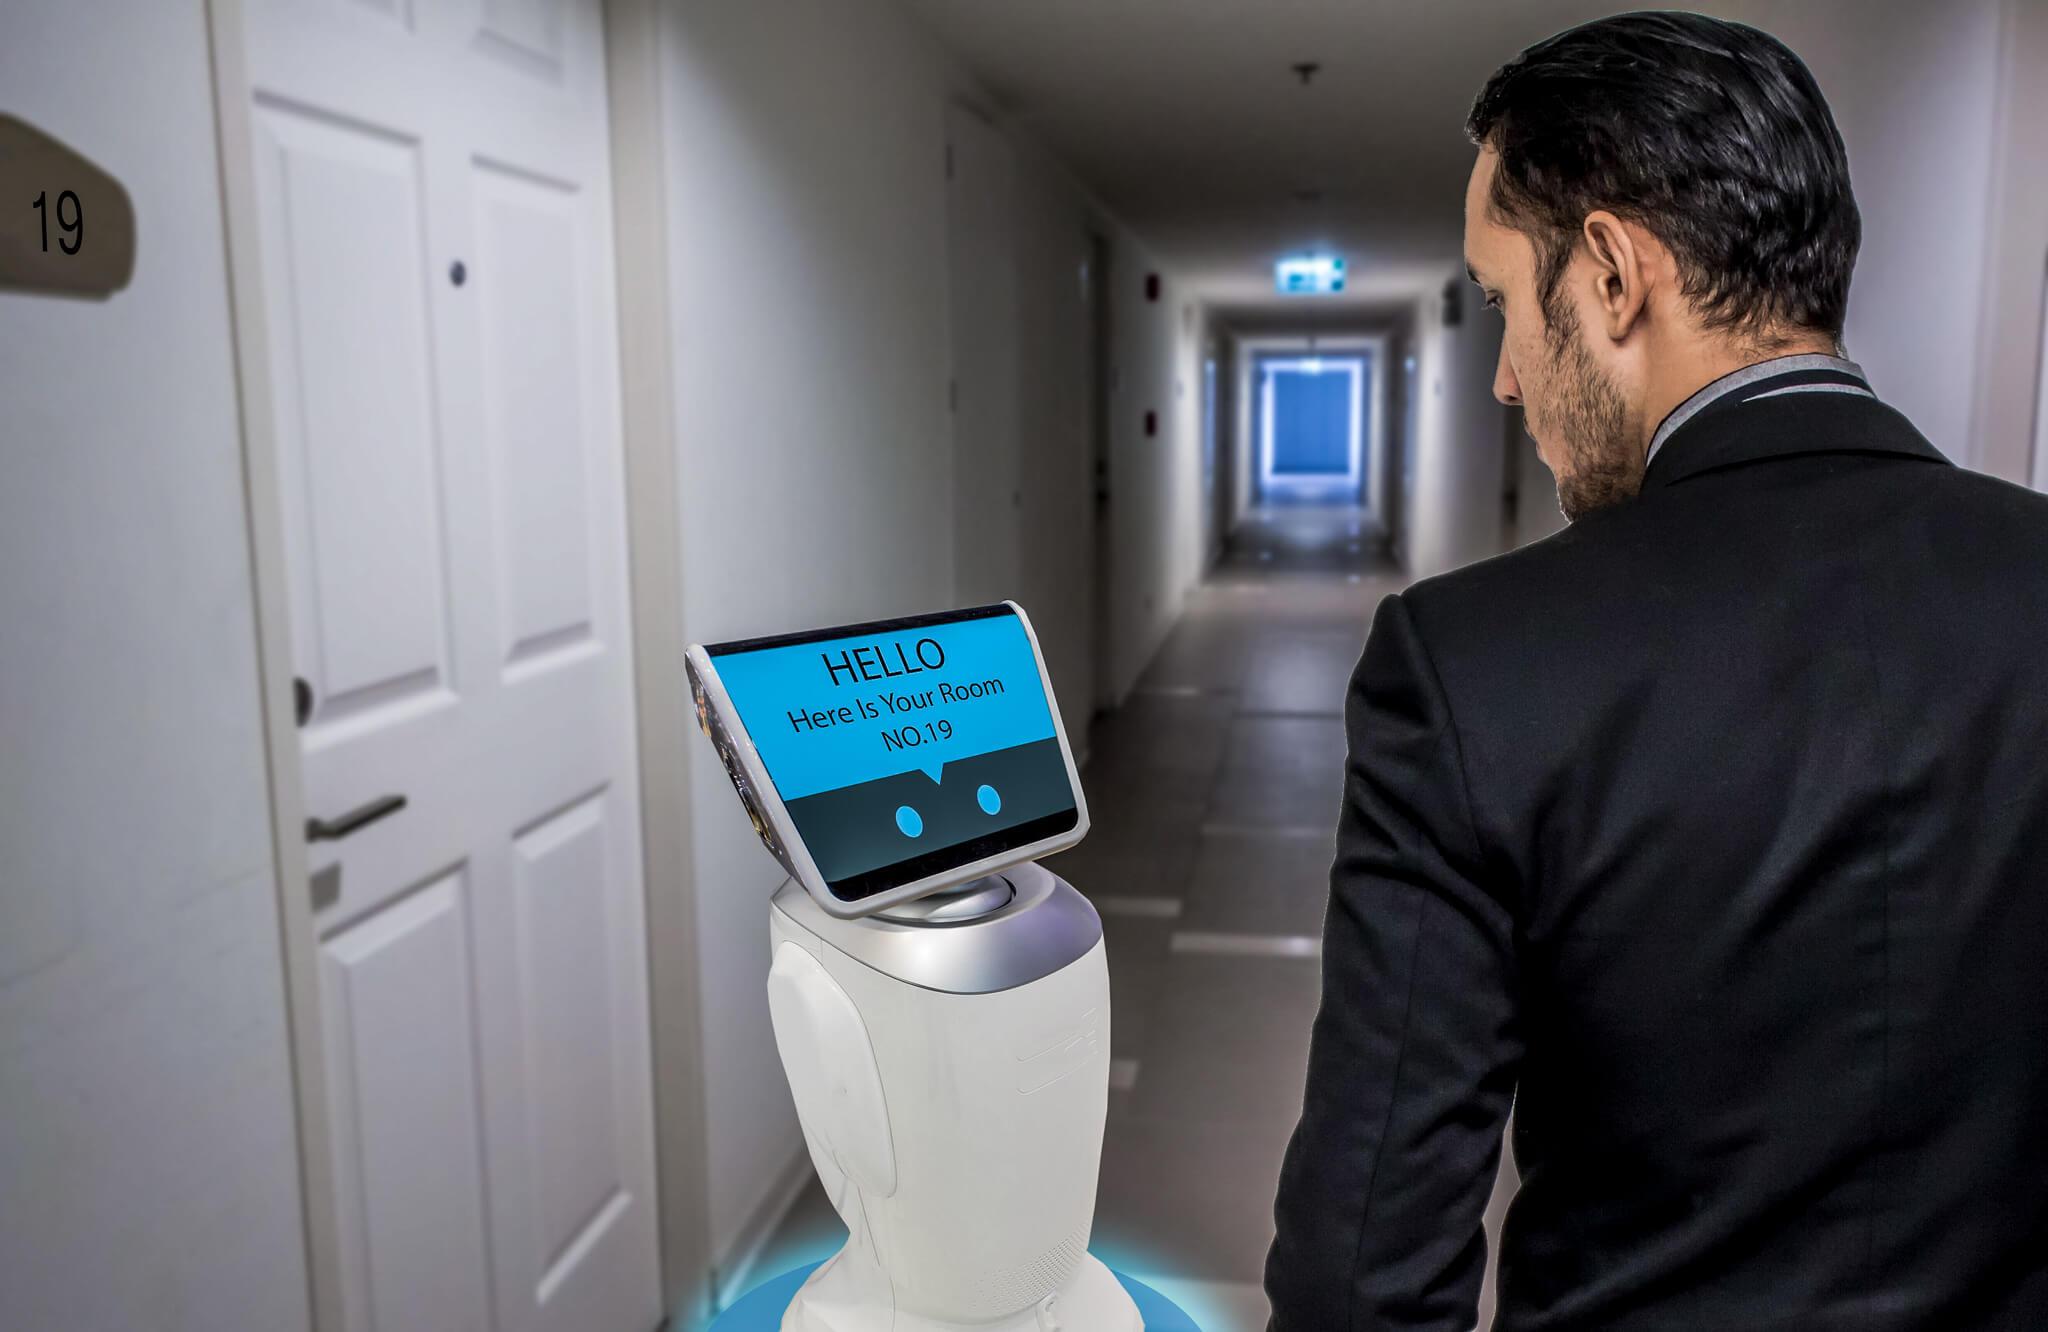 future hotel trend robots corona